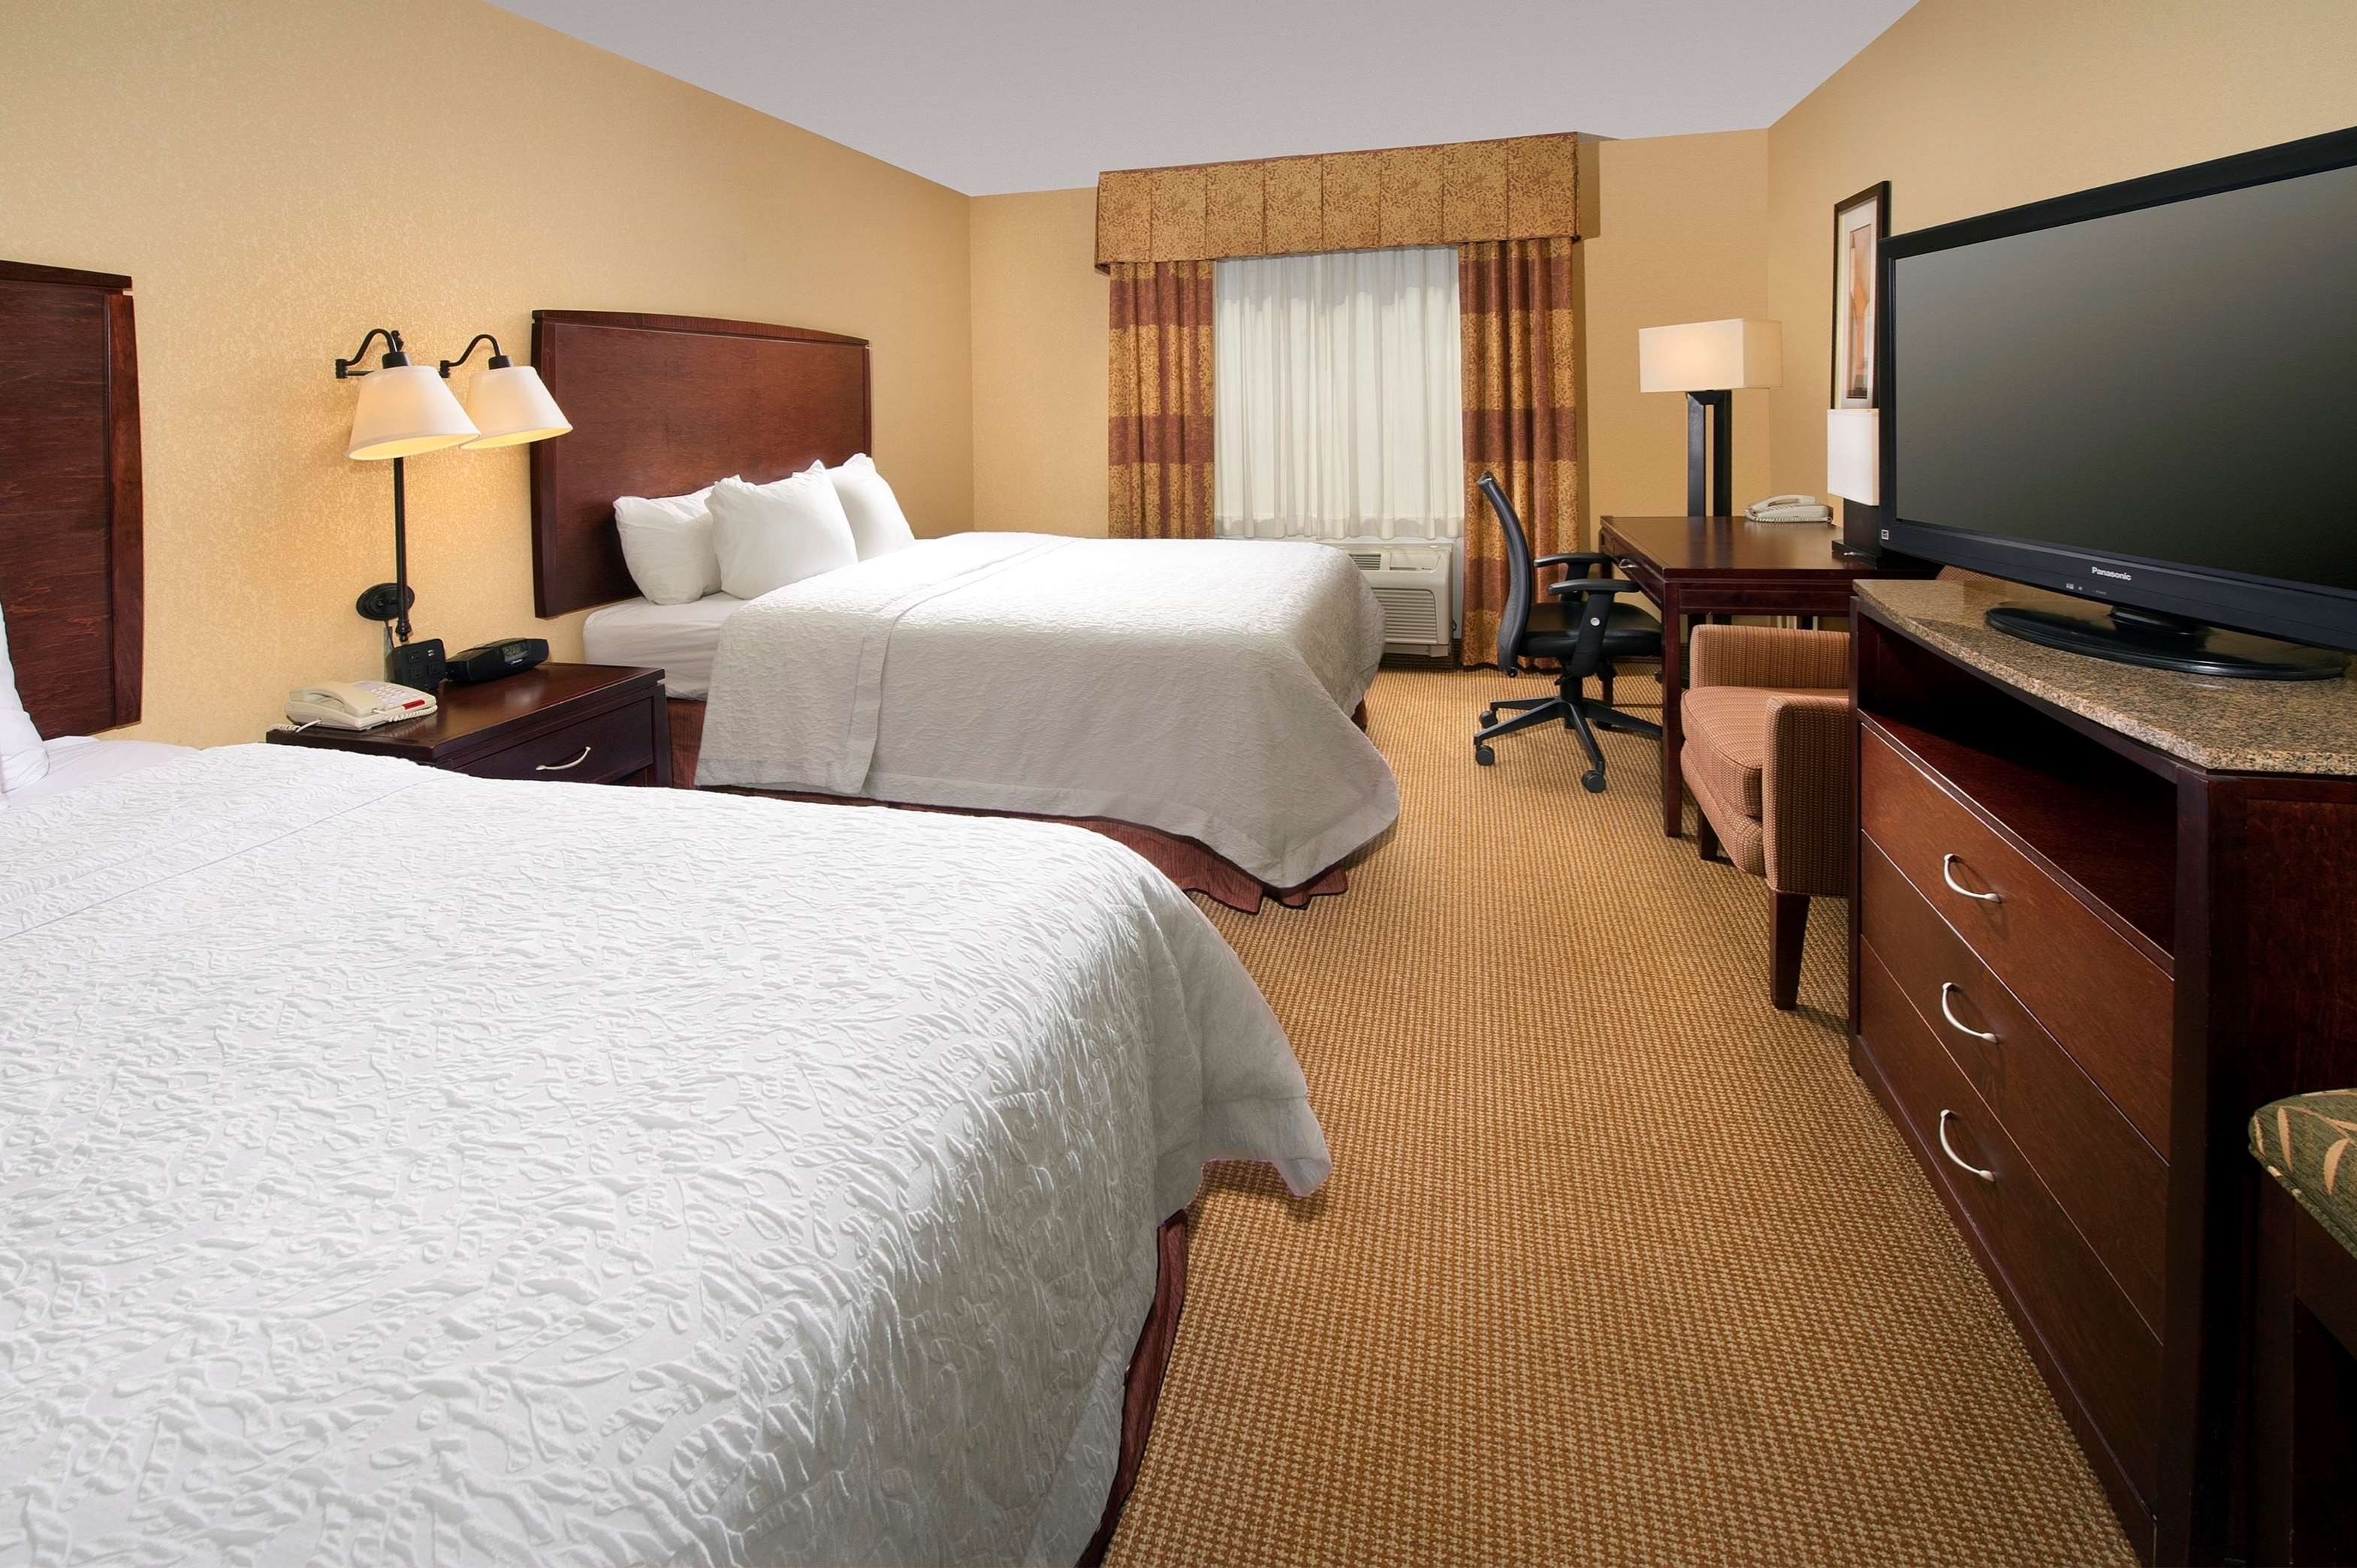 Hampton Inn & Suites San Antonio-Airport image 23